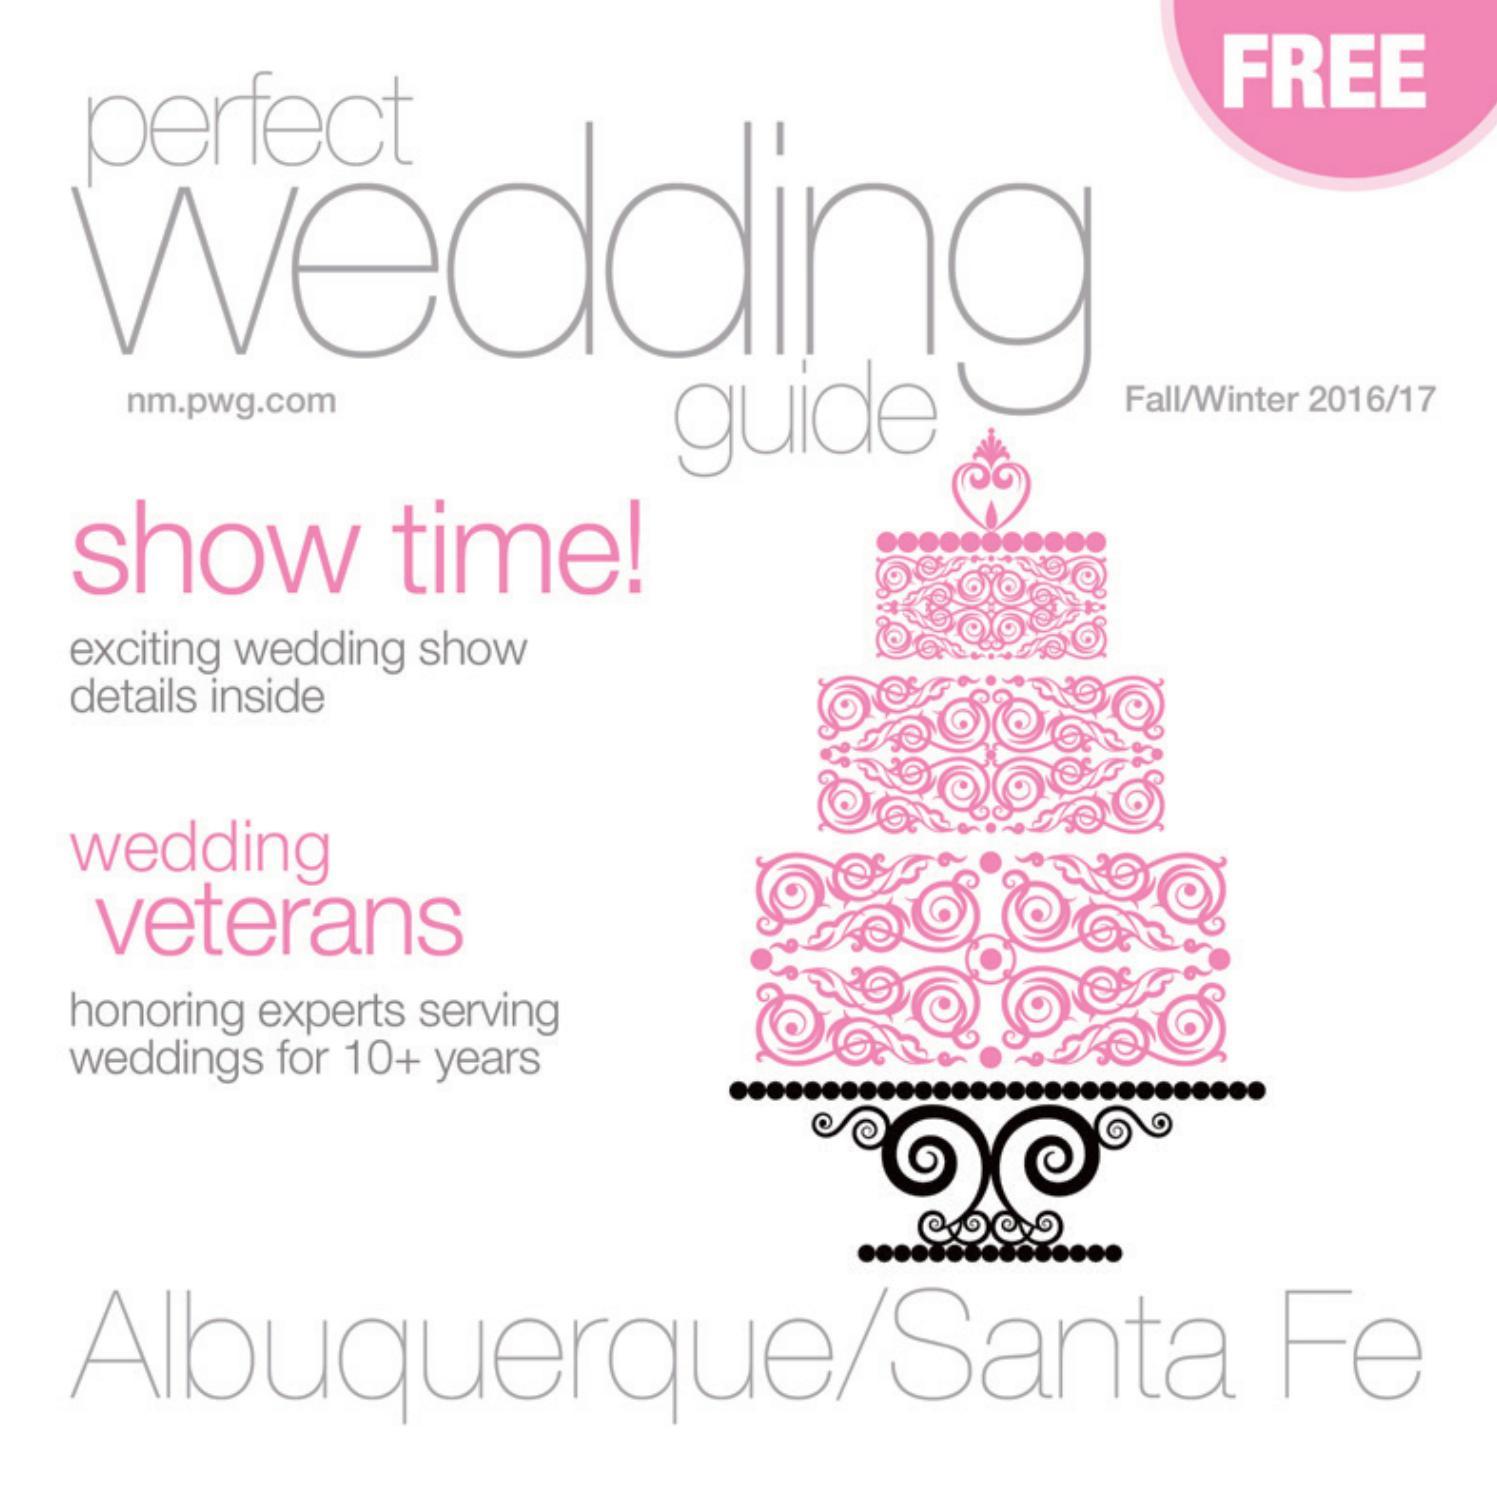 Perfect Wedding Guide Albuquerque/Santa Fe Fall/Winter 2016/17 by ...